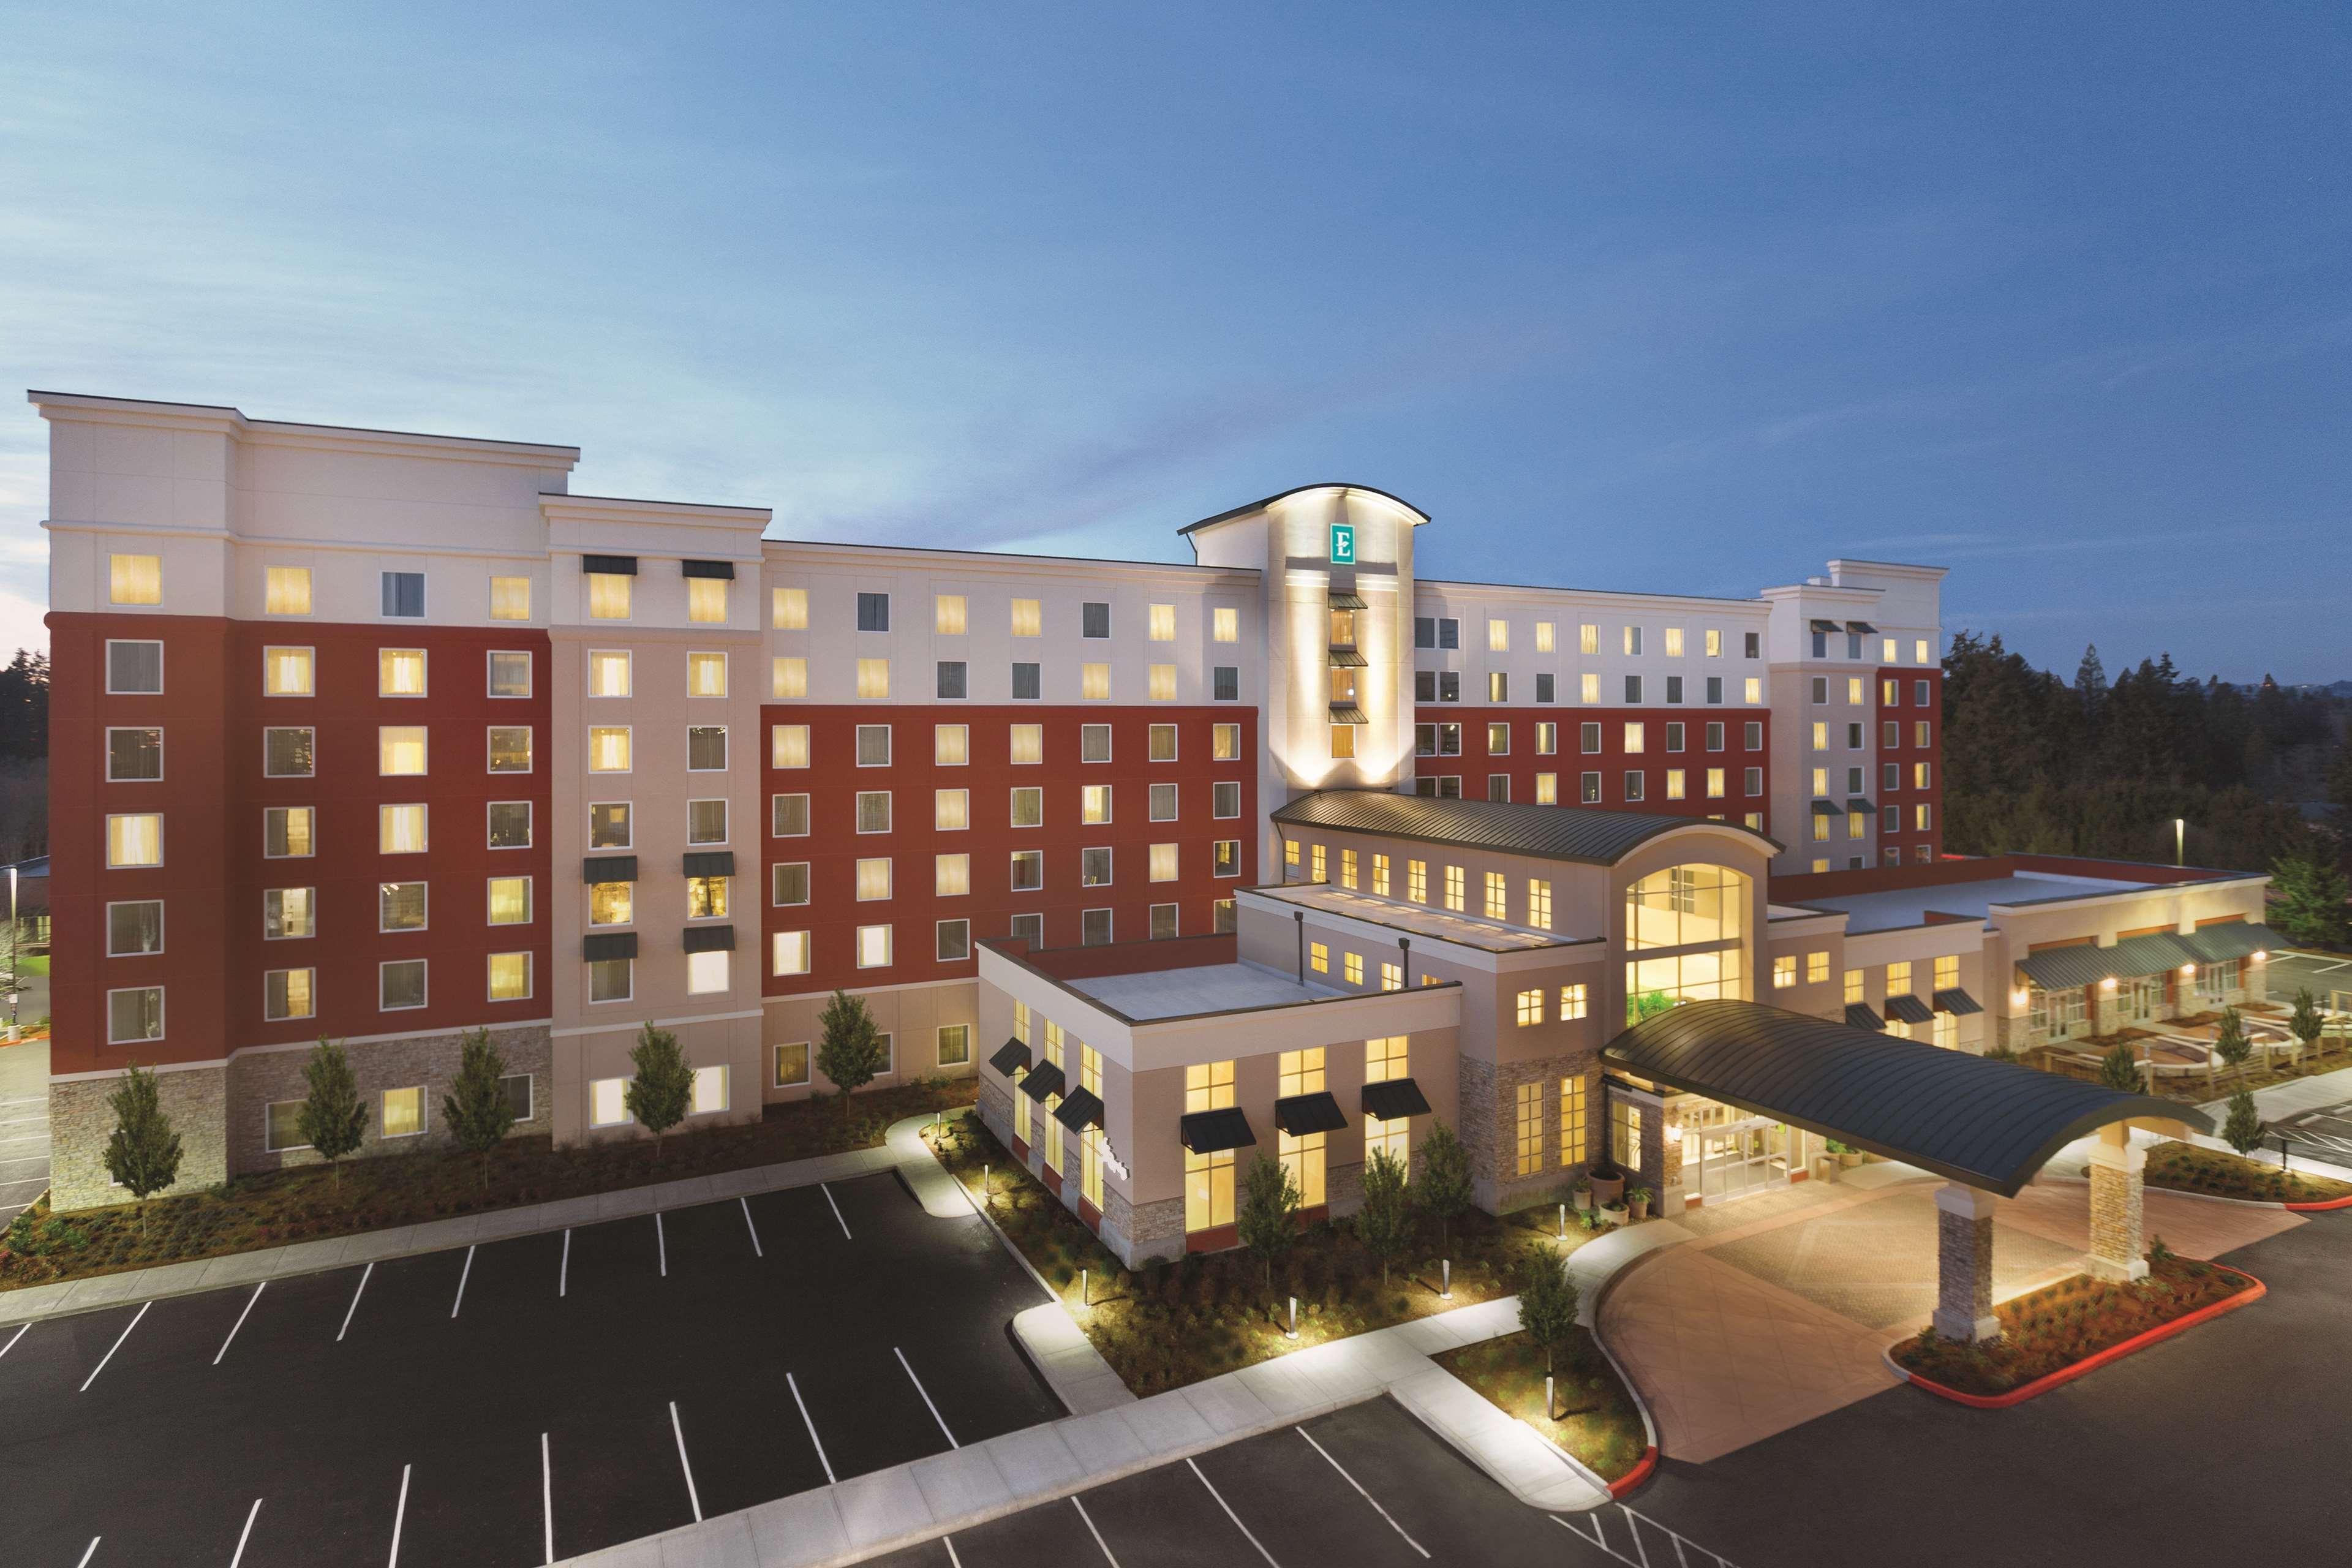 Embassy Suites by Hilton Portland Hillsboro, Oregon image 2